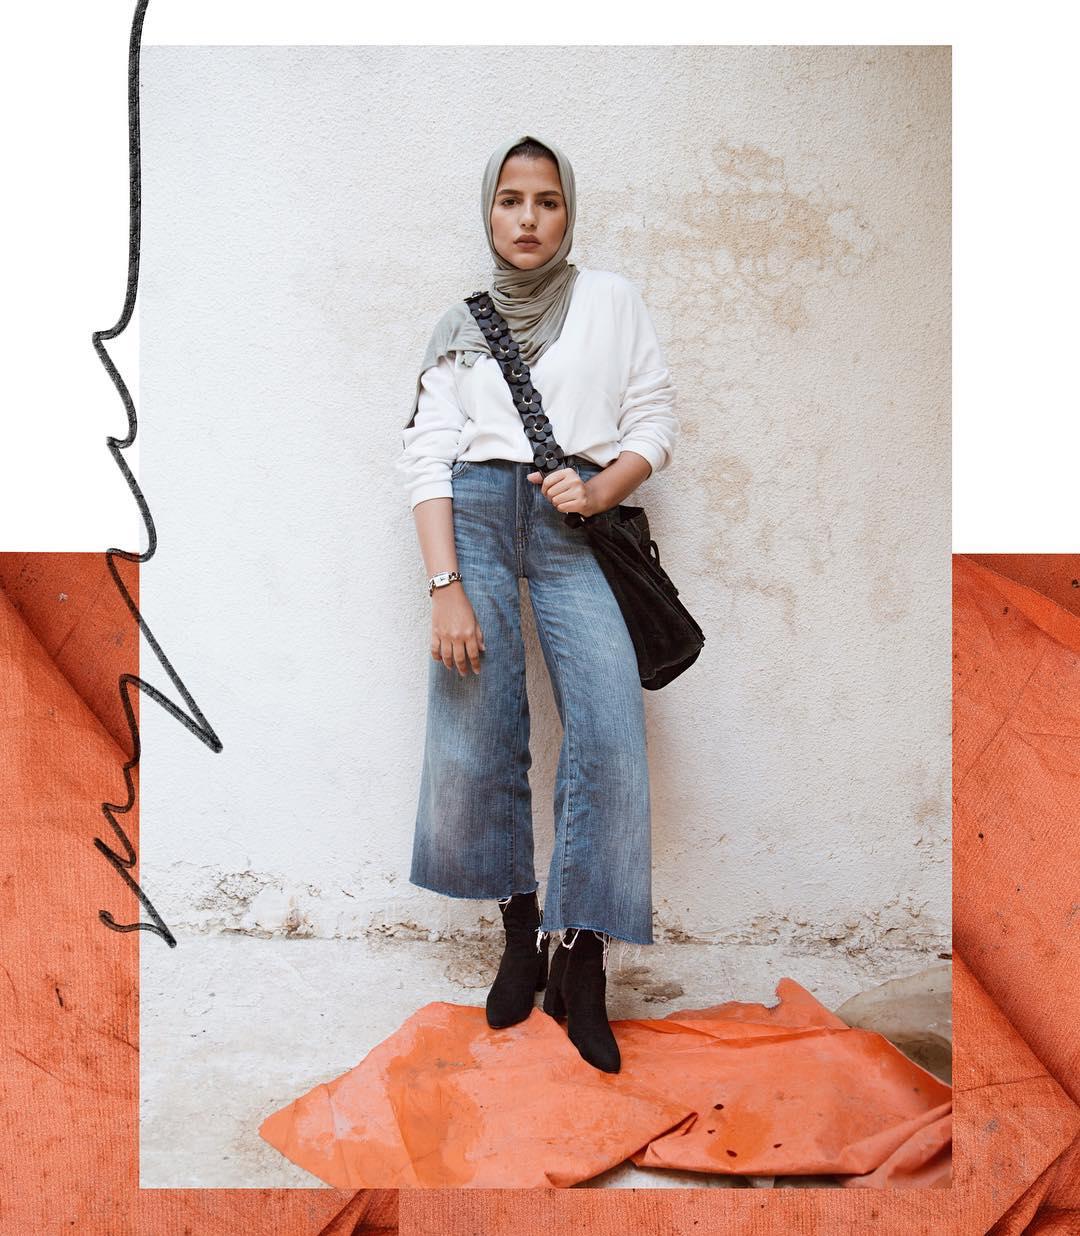 Aya Barqawi, photo by Aya Barqawi and Abdulwahab Barqawi